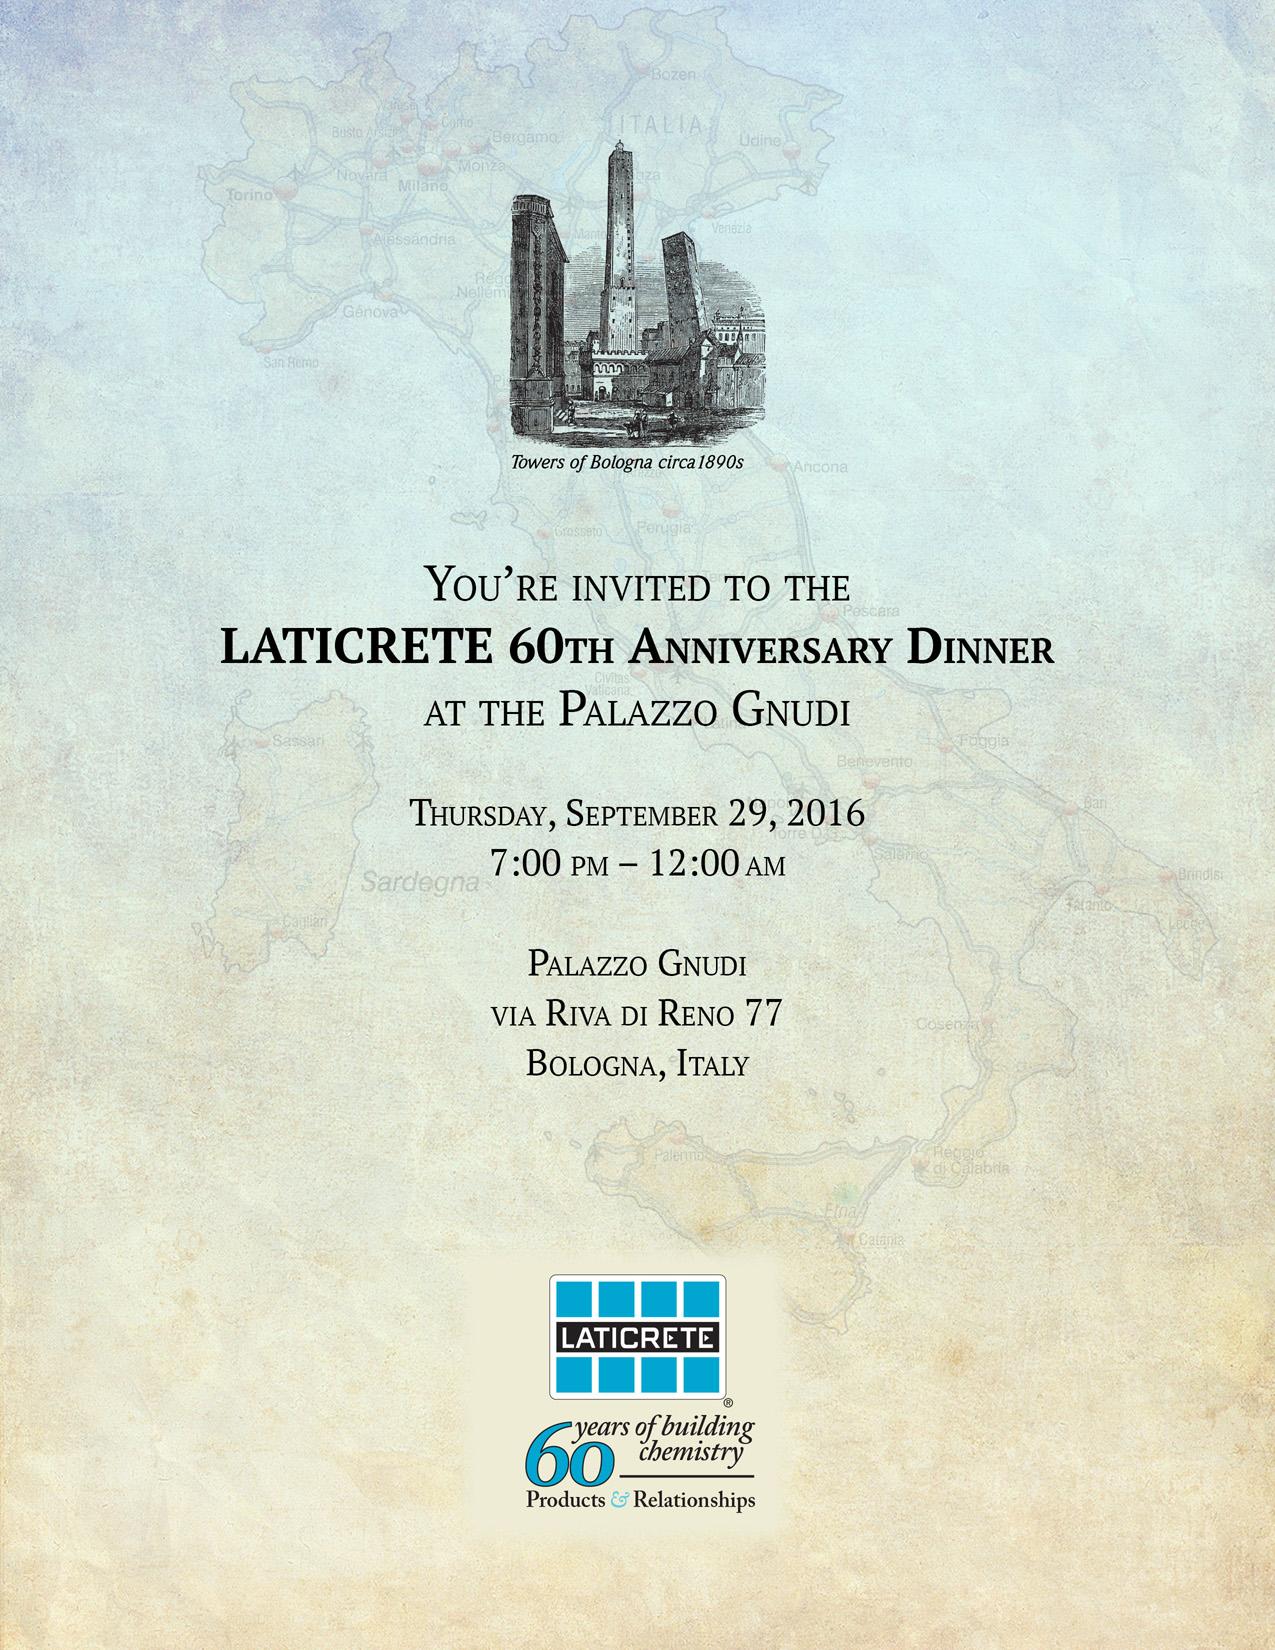 LATICRETE 60th Anniversary Dinner